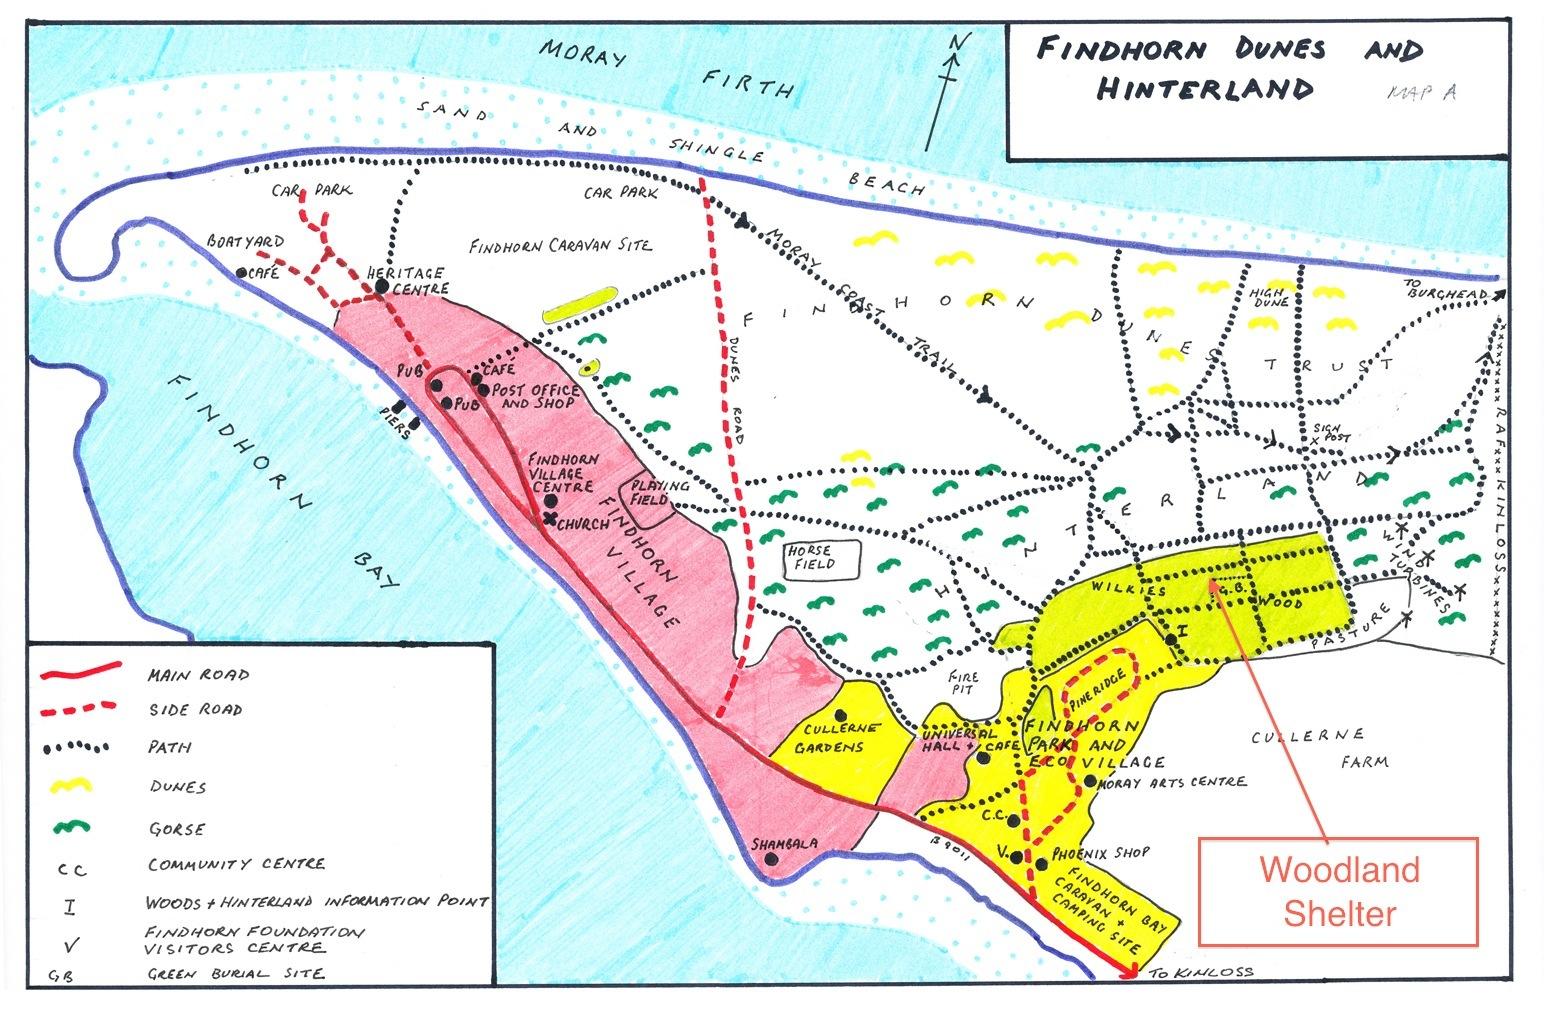 Findhorn Hinterland map